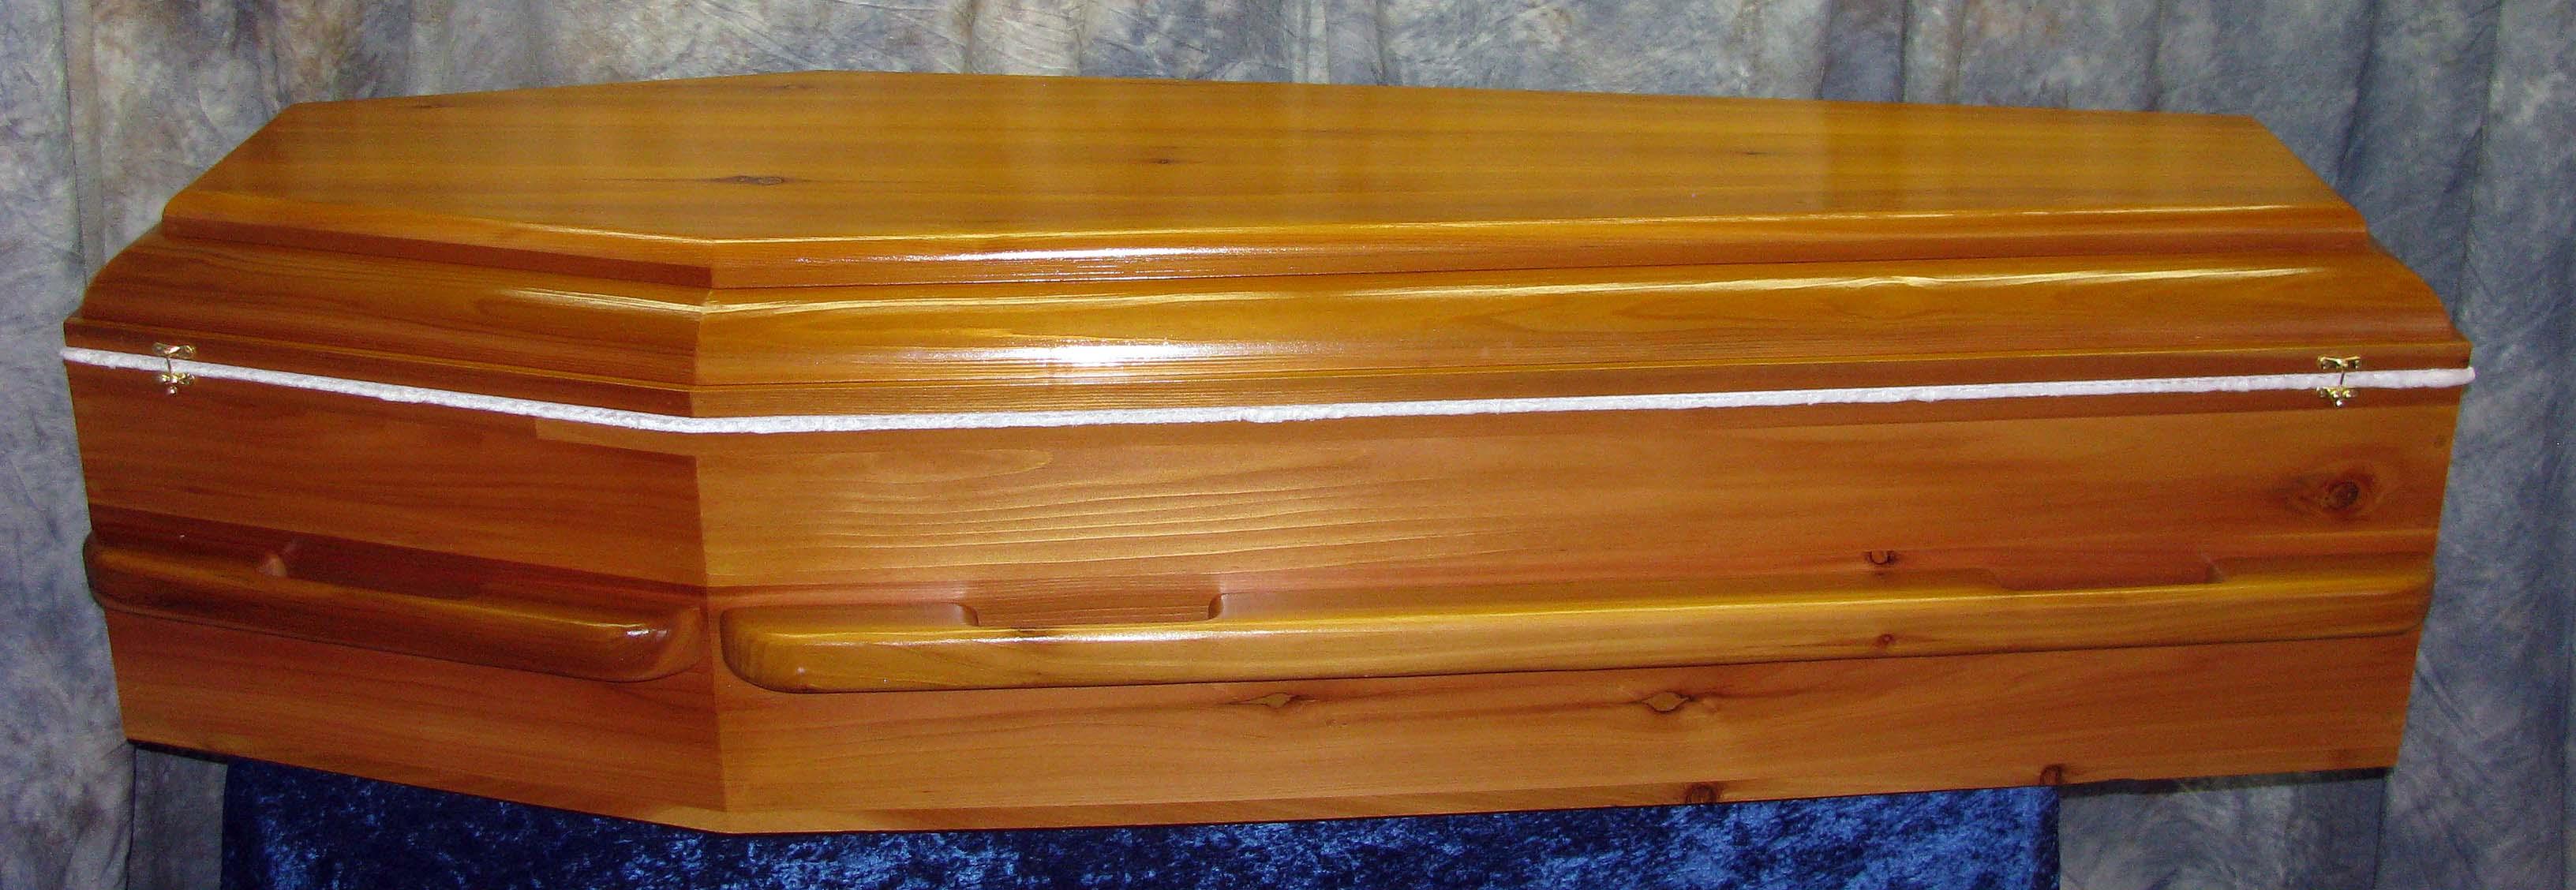 Index of /images/coffins